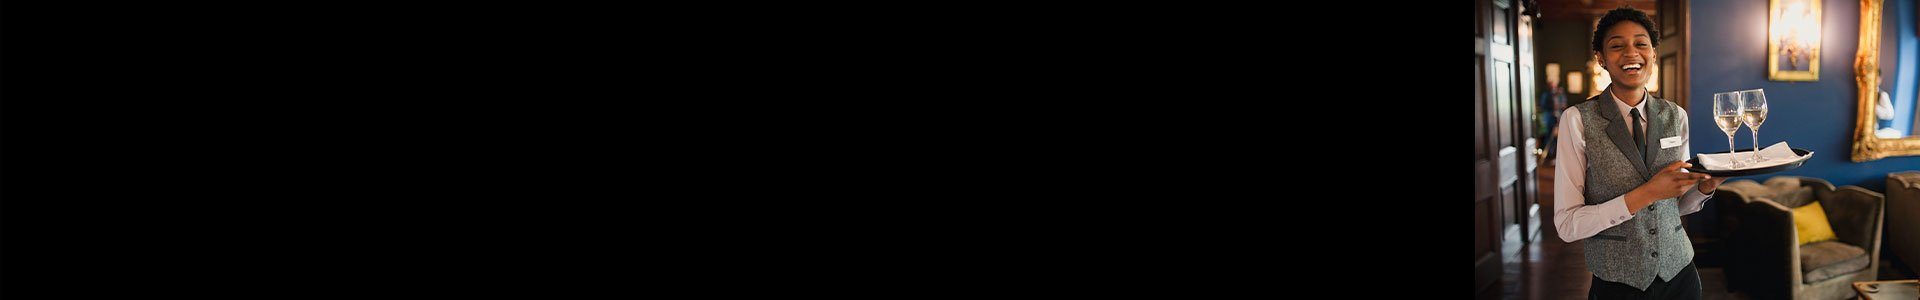 200325-IHG-SignUpPage